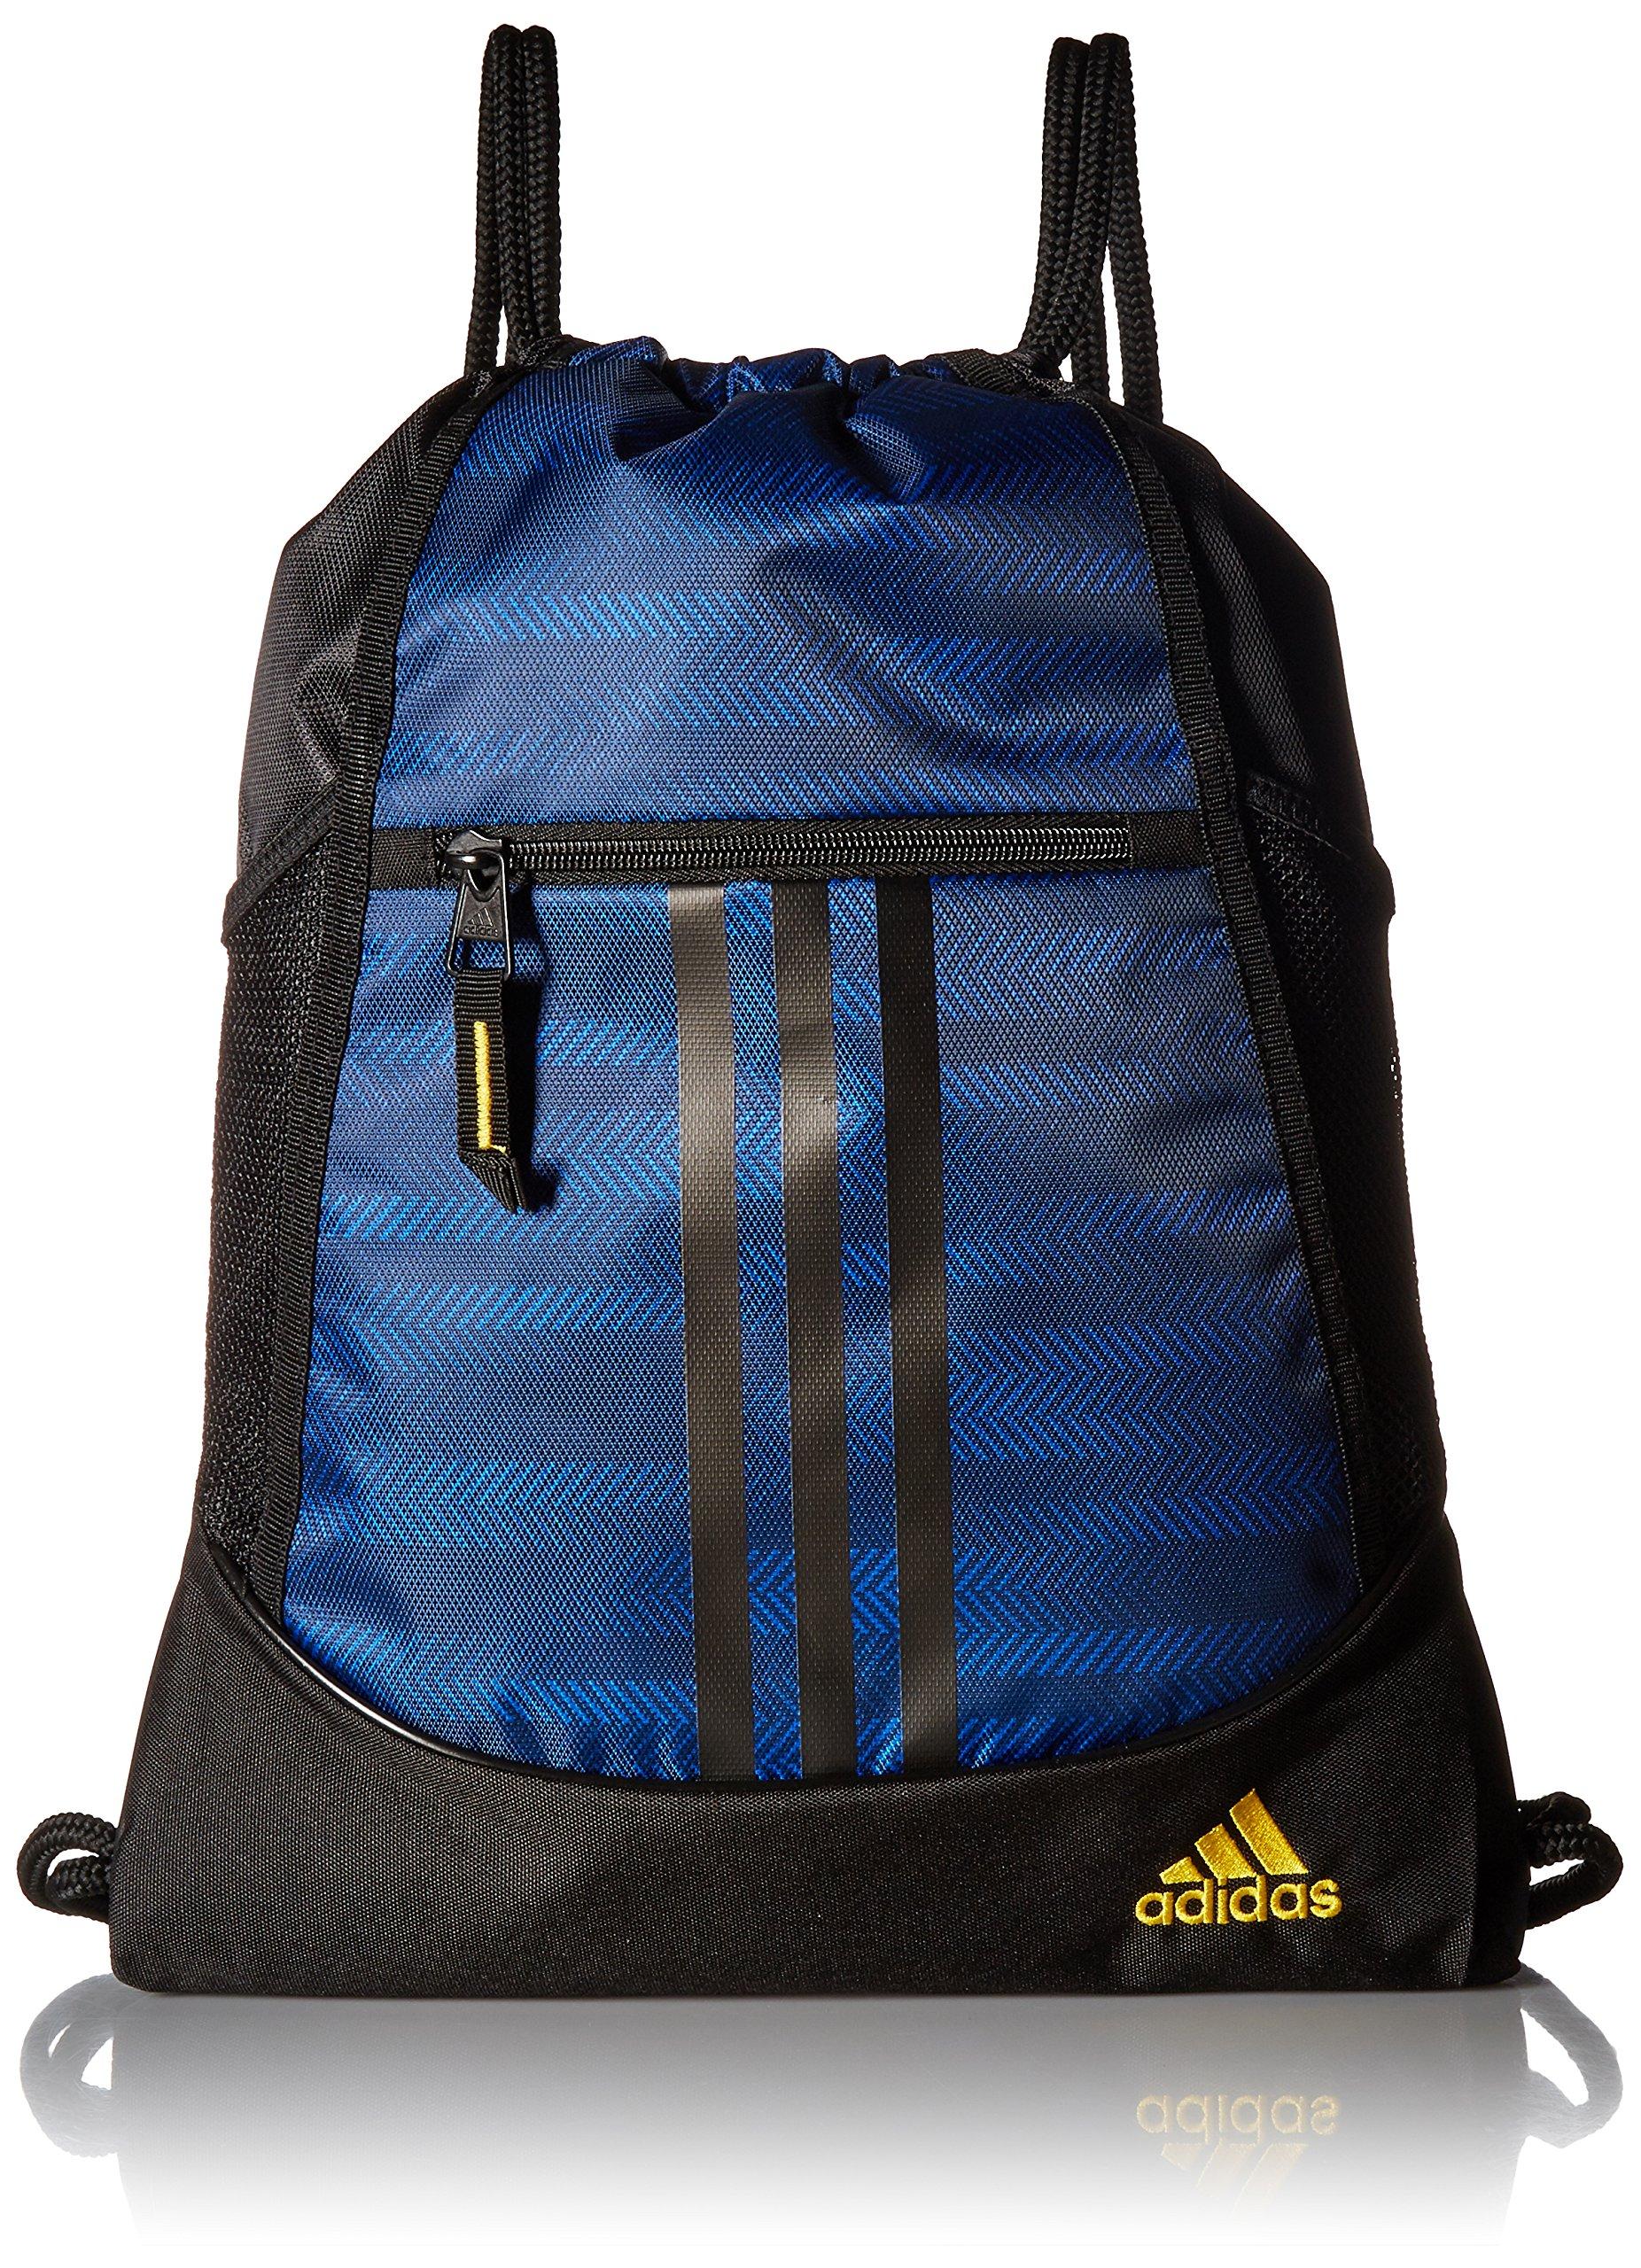 adidas Alliance II Sack Pack, One Size, Blue Ratio/Black/Equatorial Yellow